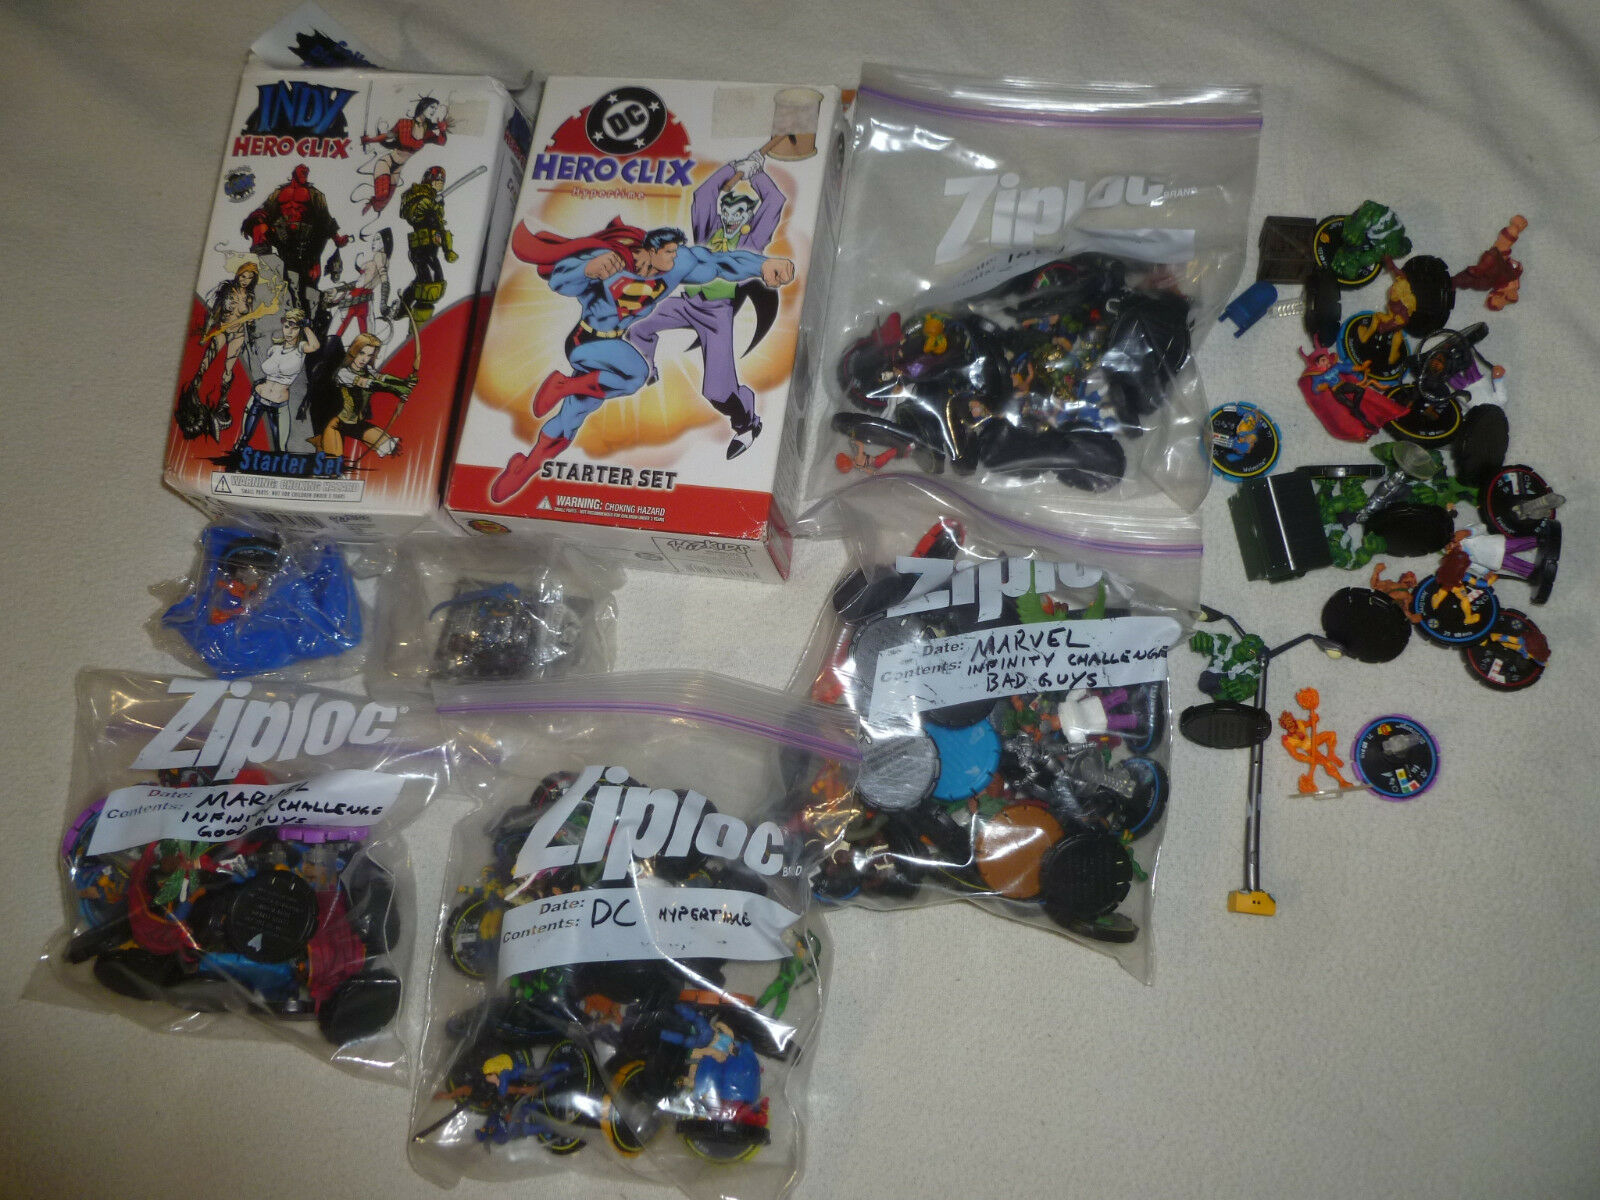 Lote de Heroclix Hero Clix Figura Juguete Marvel Infinity desafío Indy DC Hypertime